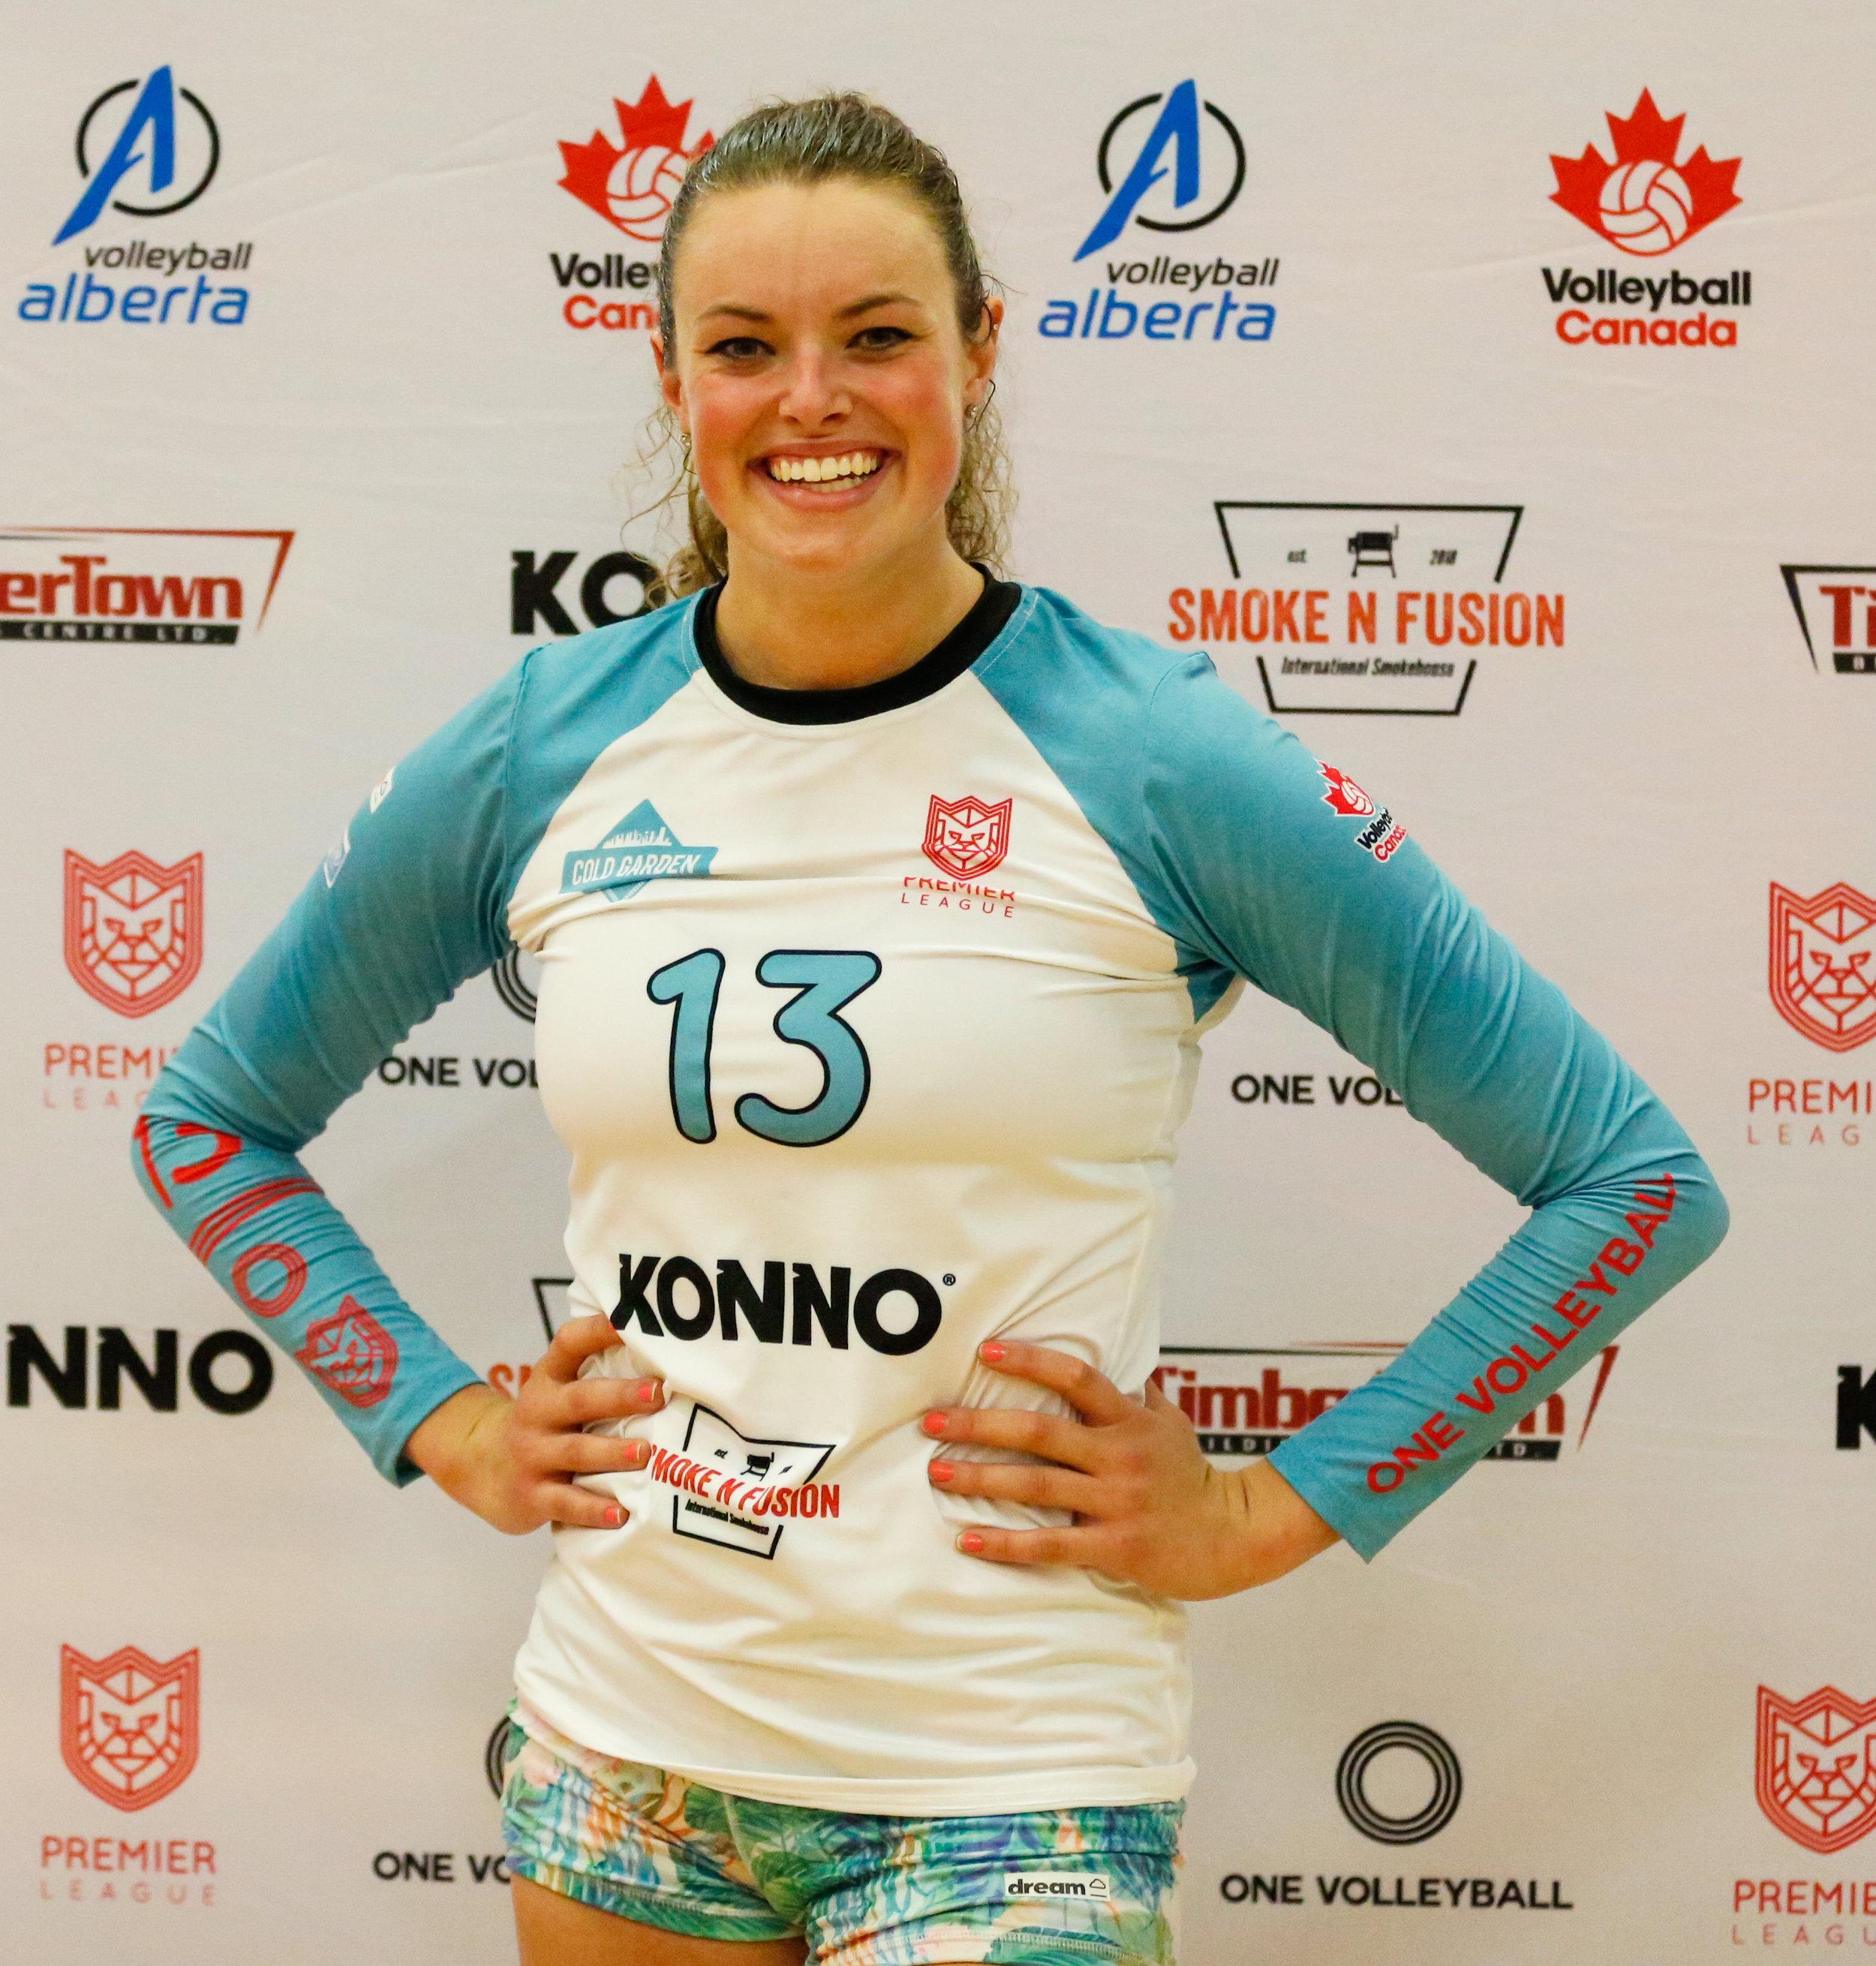 20190717 One Volleyball women's Finals DH 0755.jpg